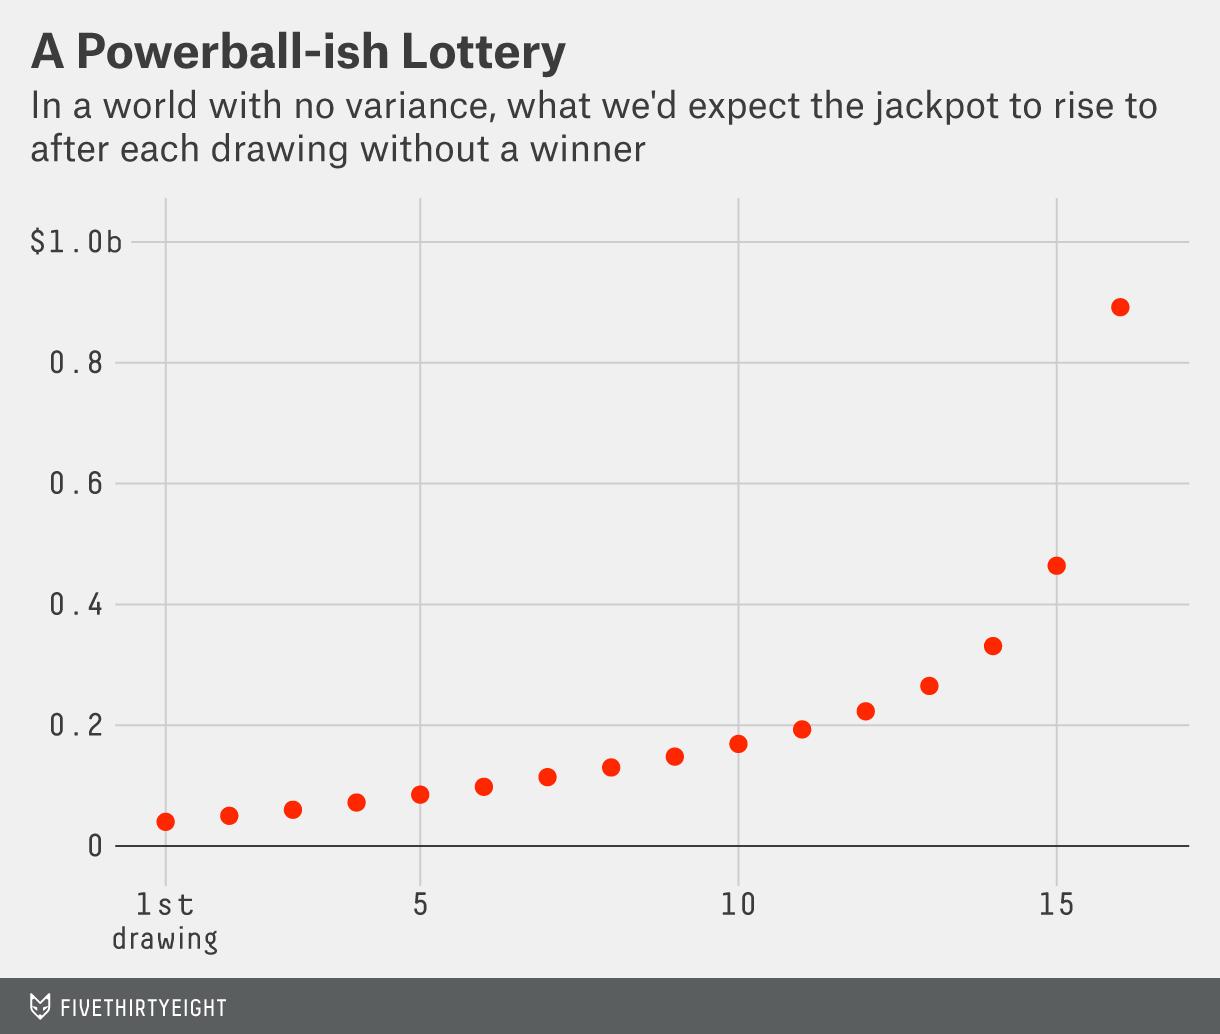 hickey-datalab-powerballchange-1